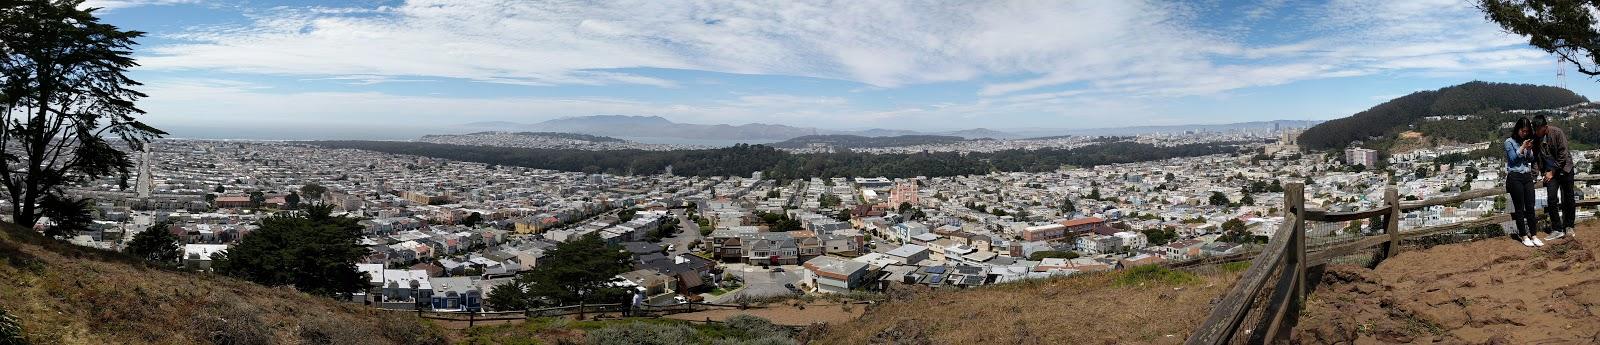 Suburbs of San Francisco